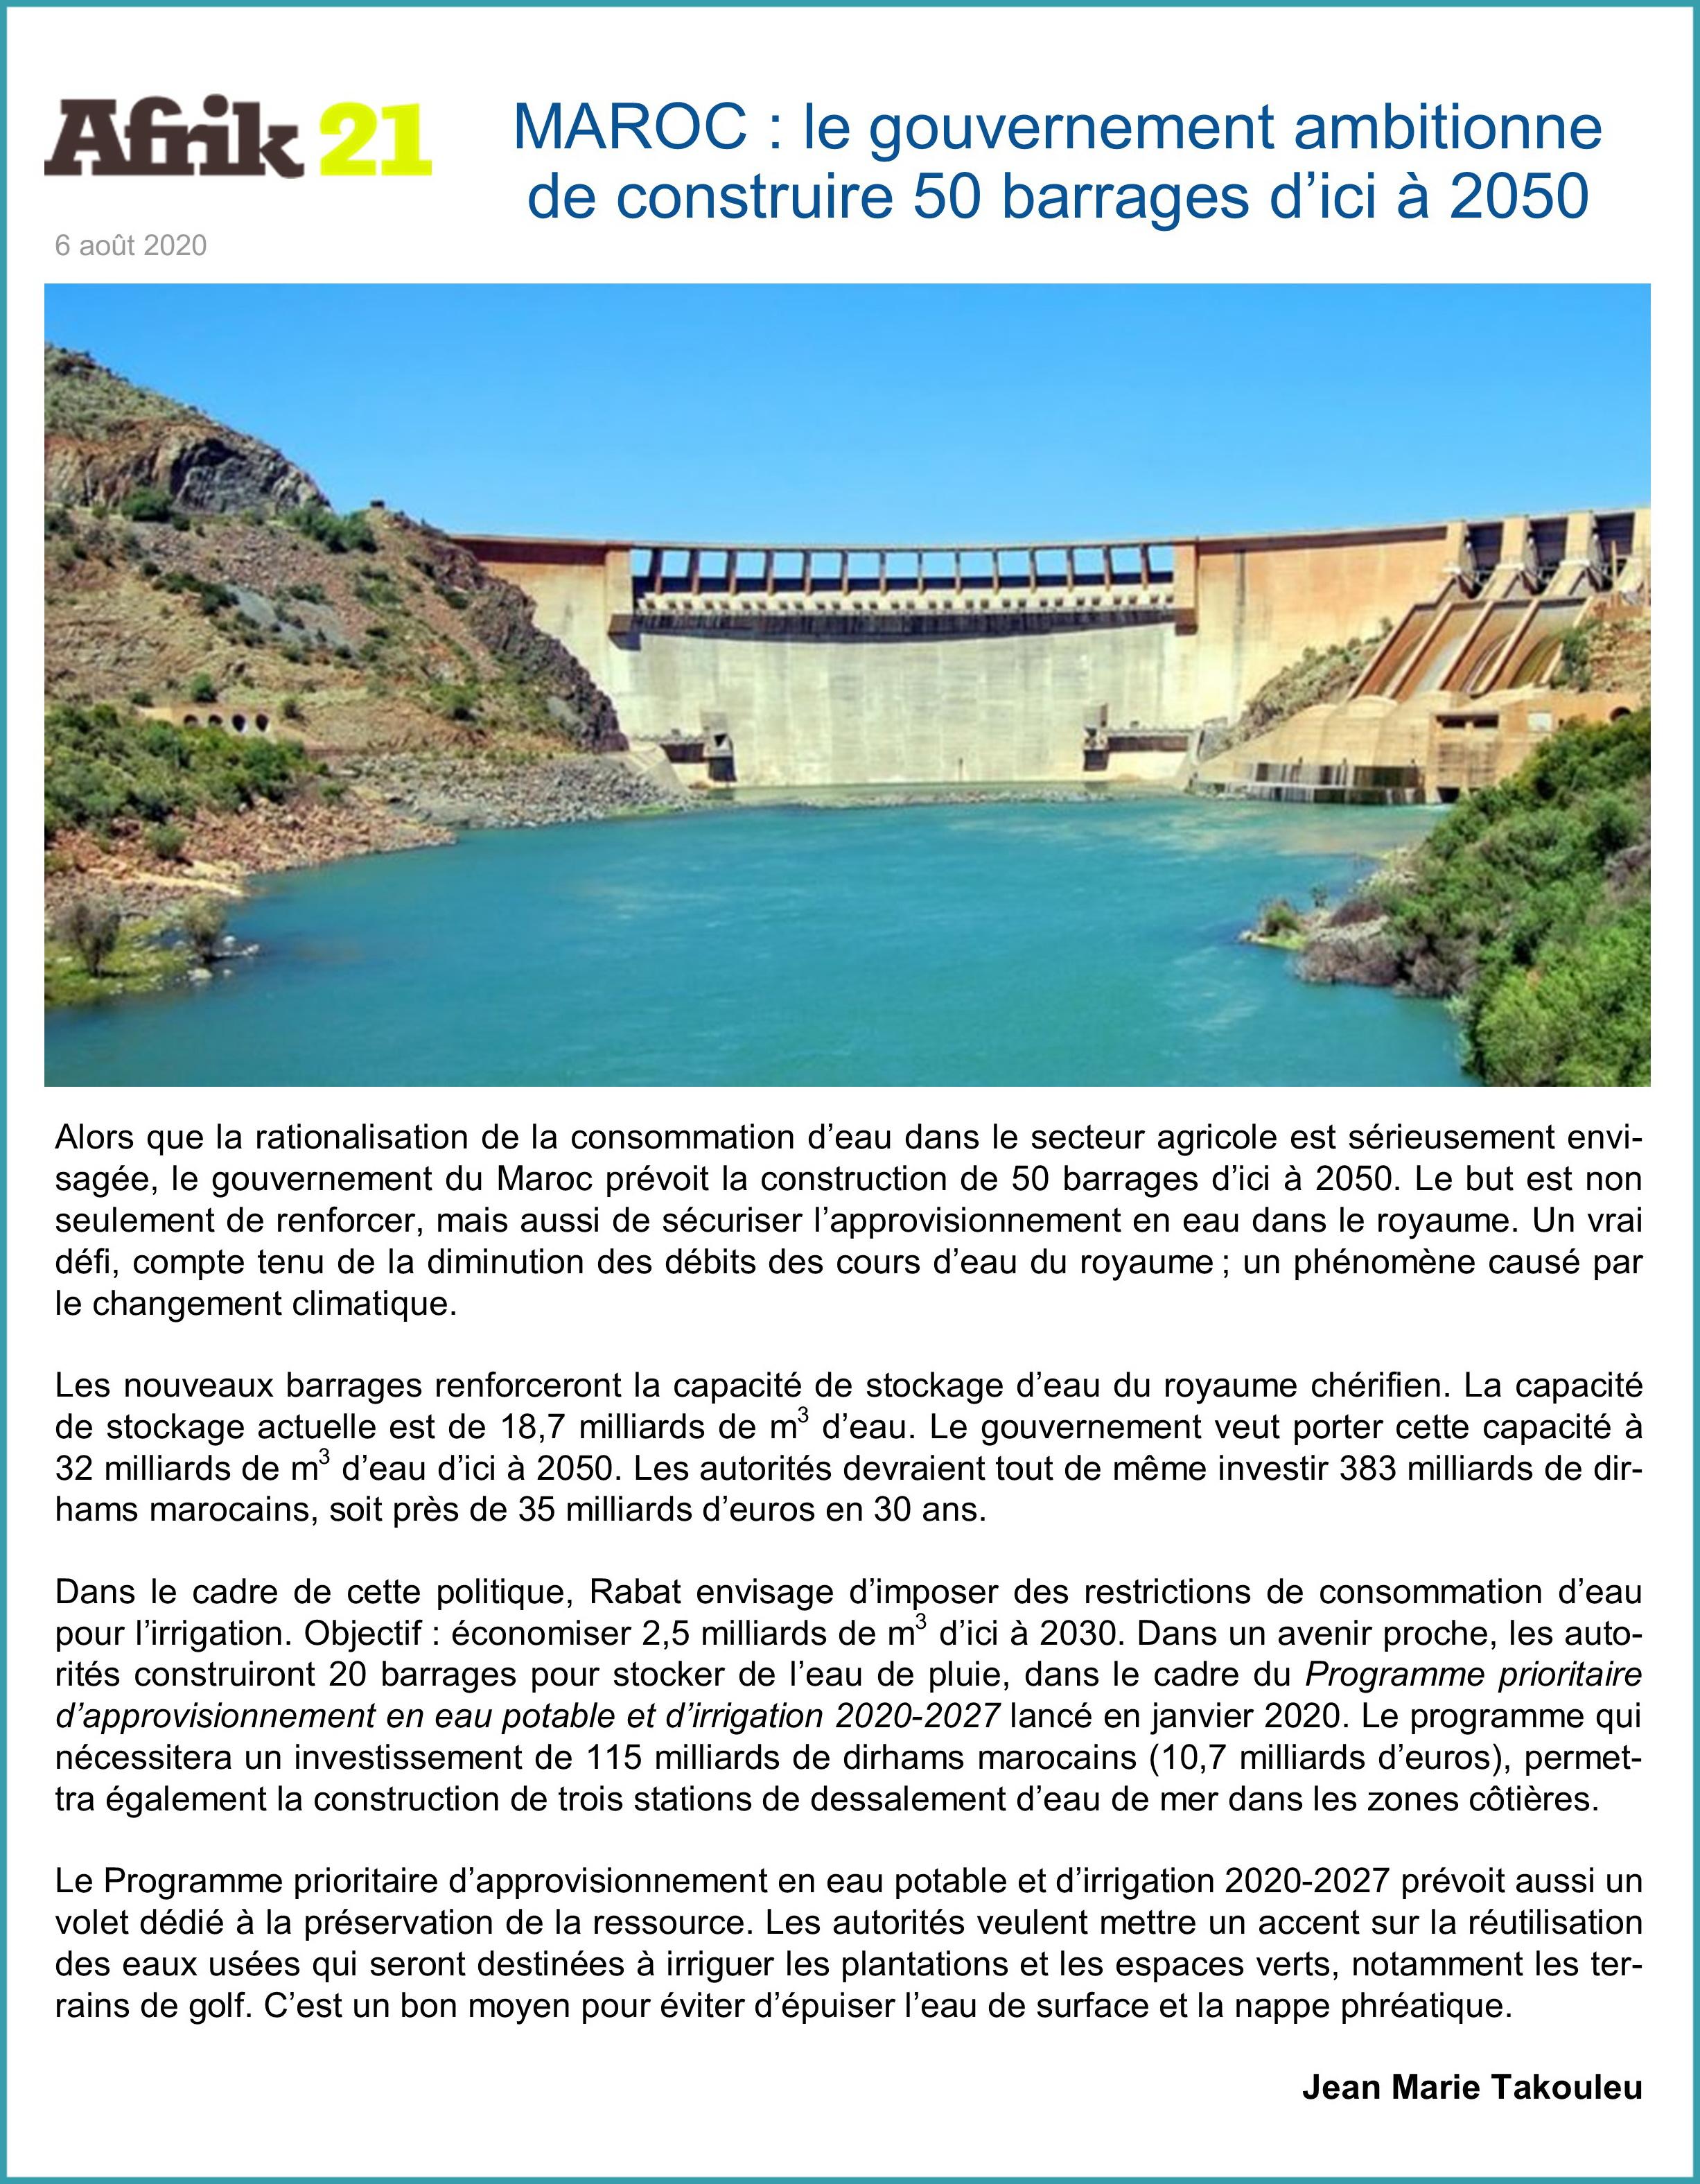 Maroc veut construire 50 barrages